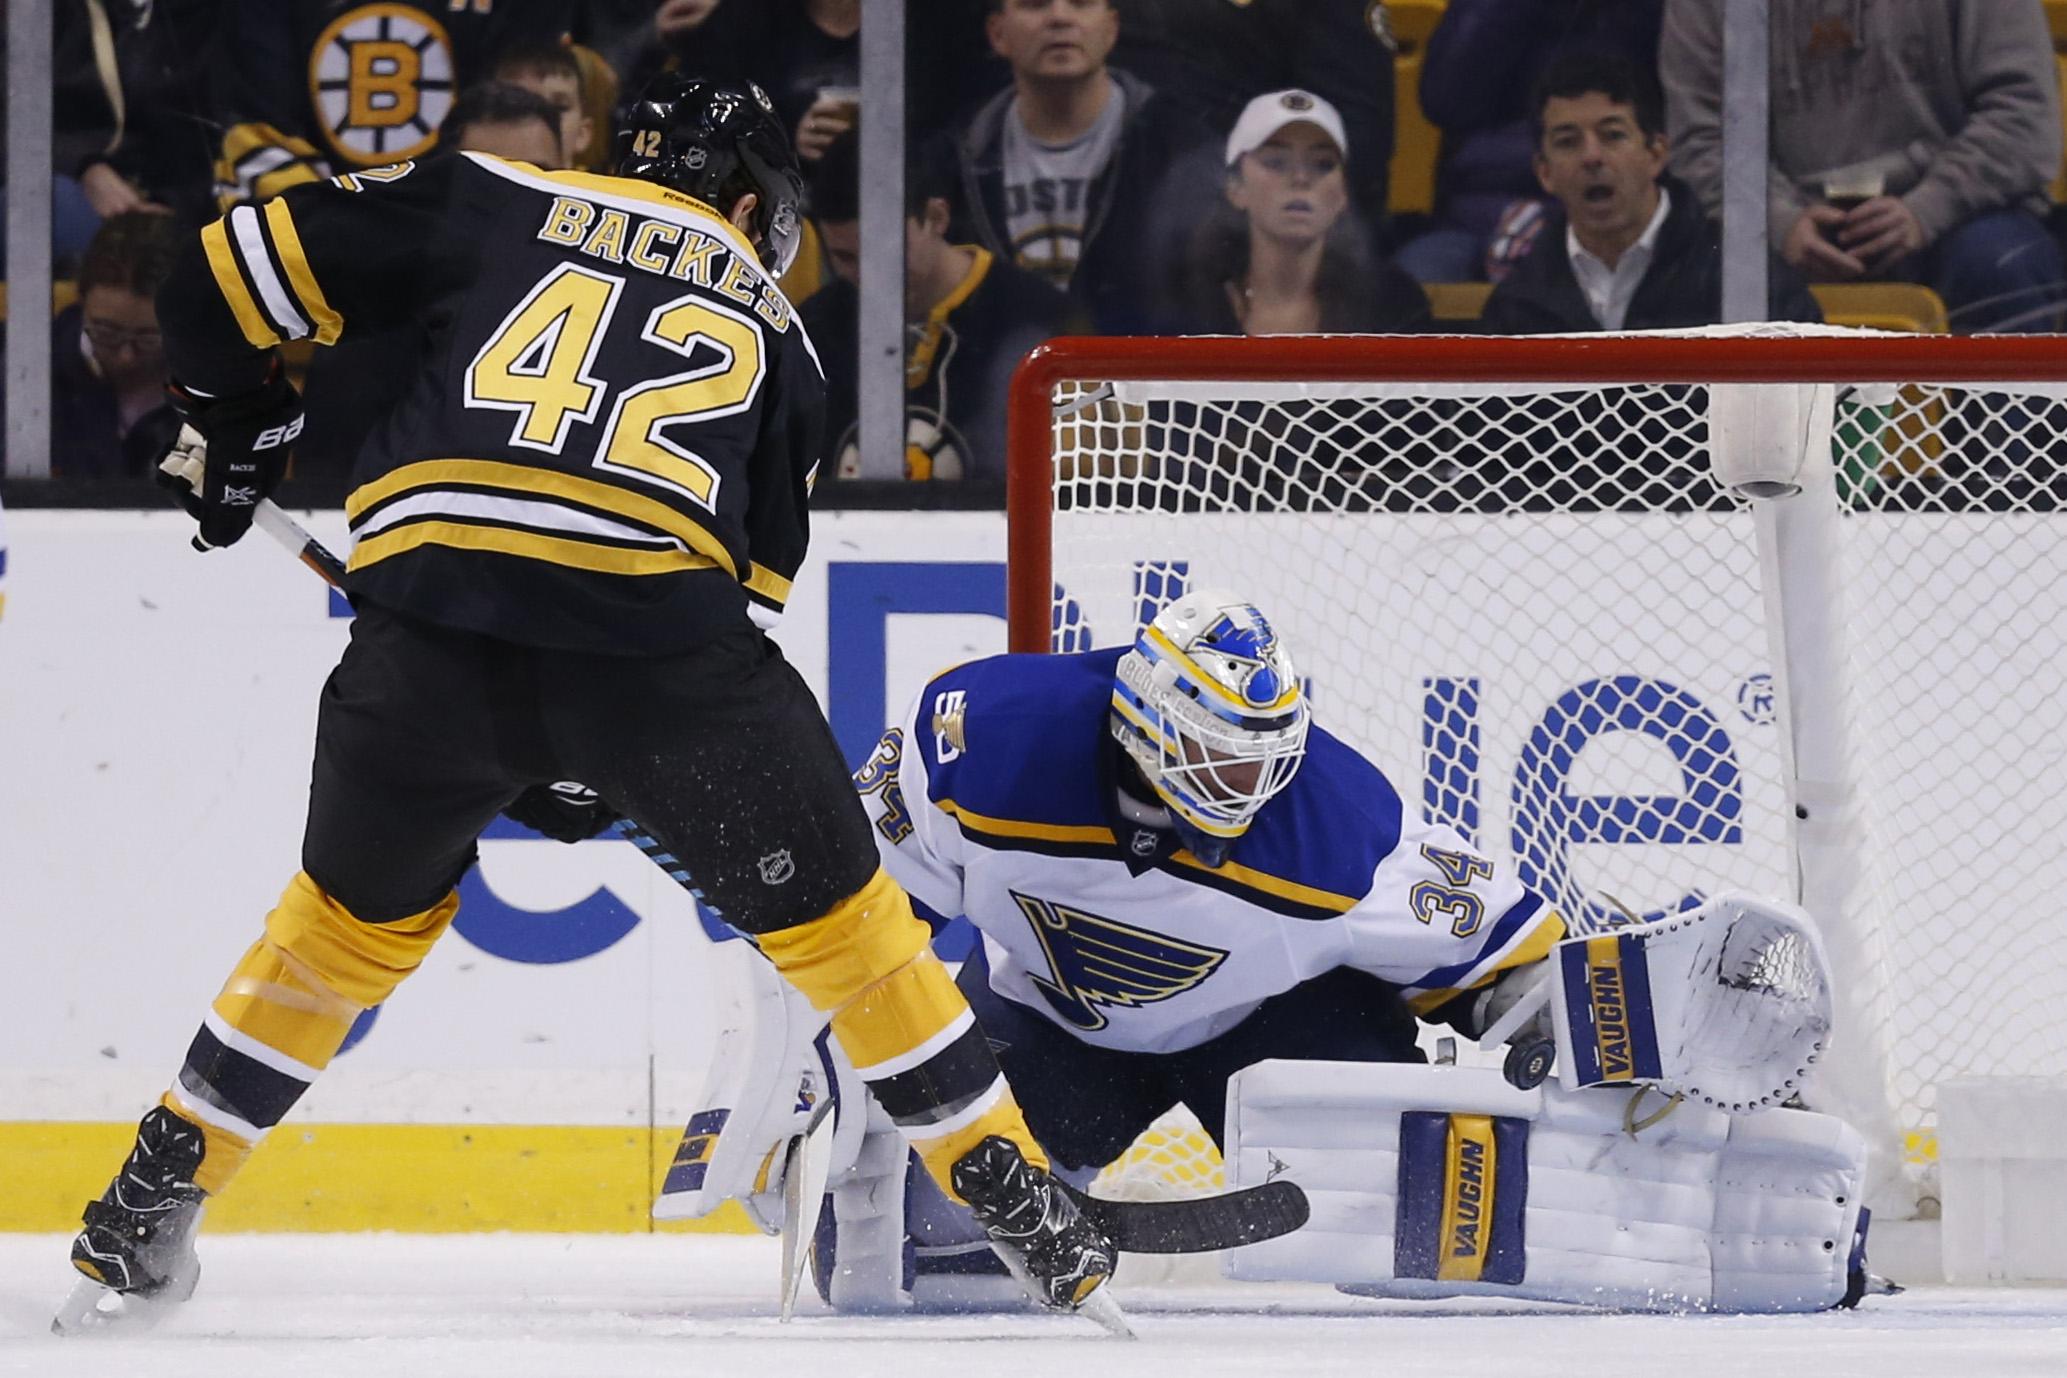 NHL: St. Louis Blues at Boston Bruins